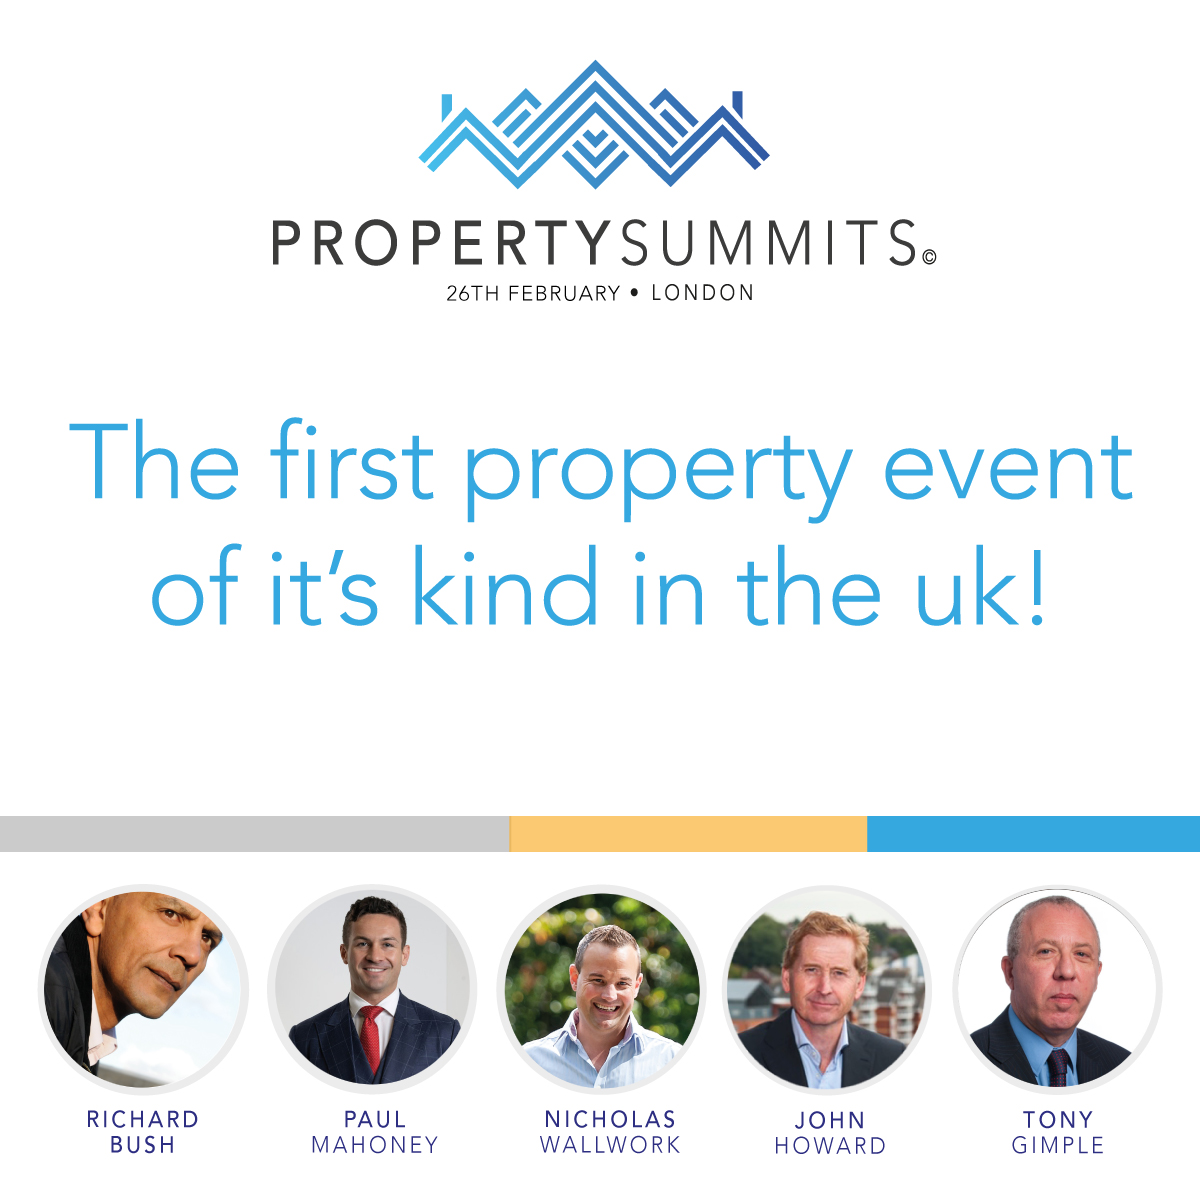 Property Summits event